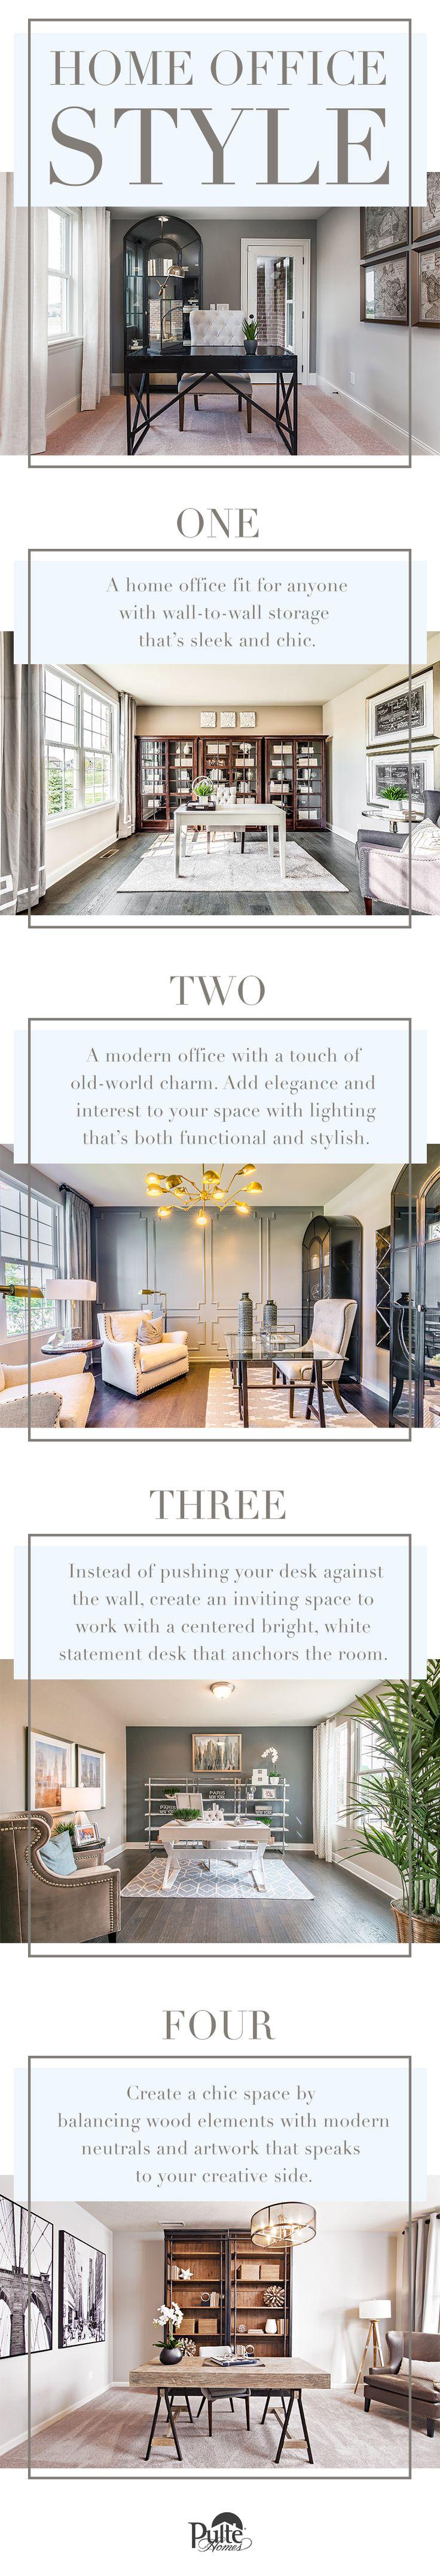 46 best Home | Office images on Pinterest | Desk, Parsons desk and ...